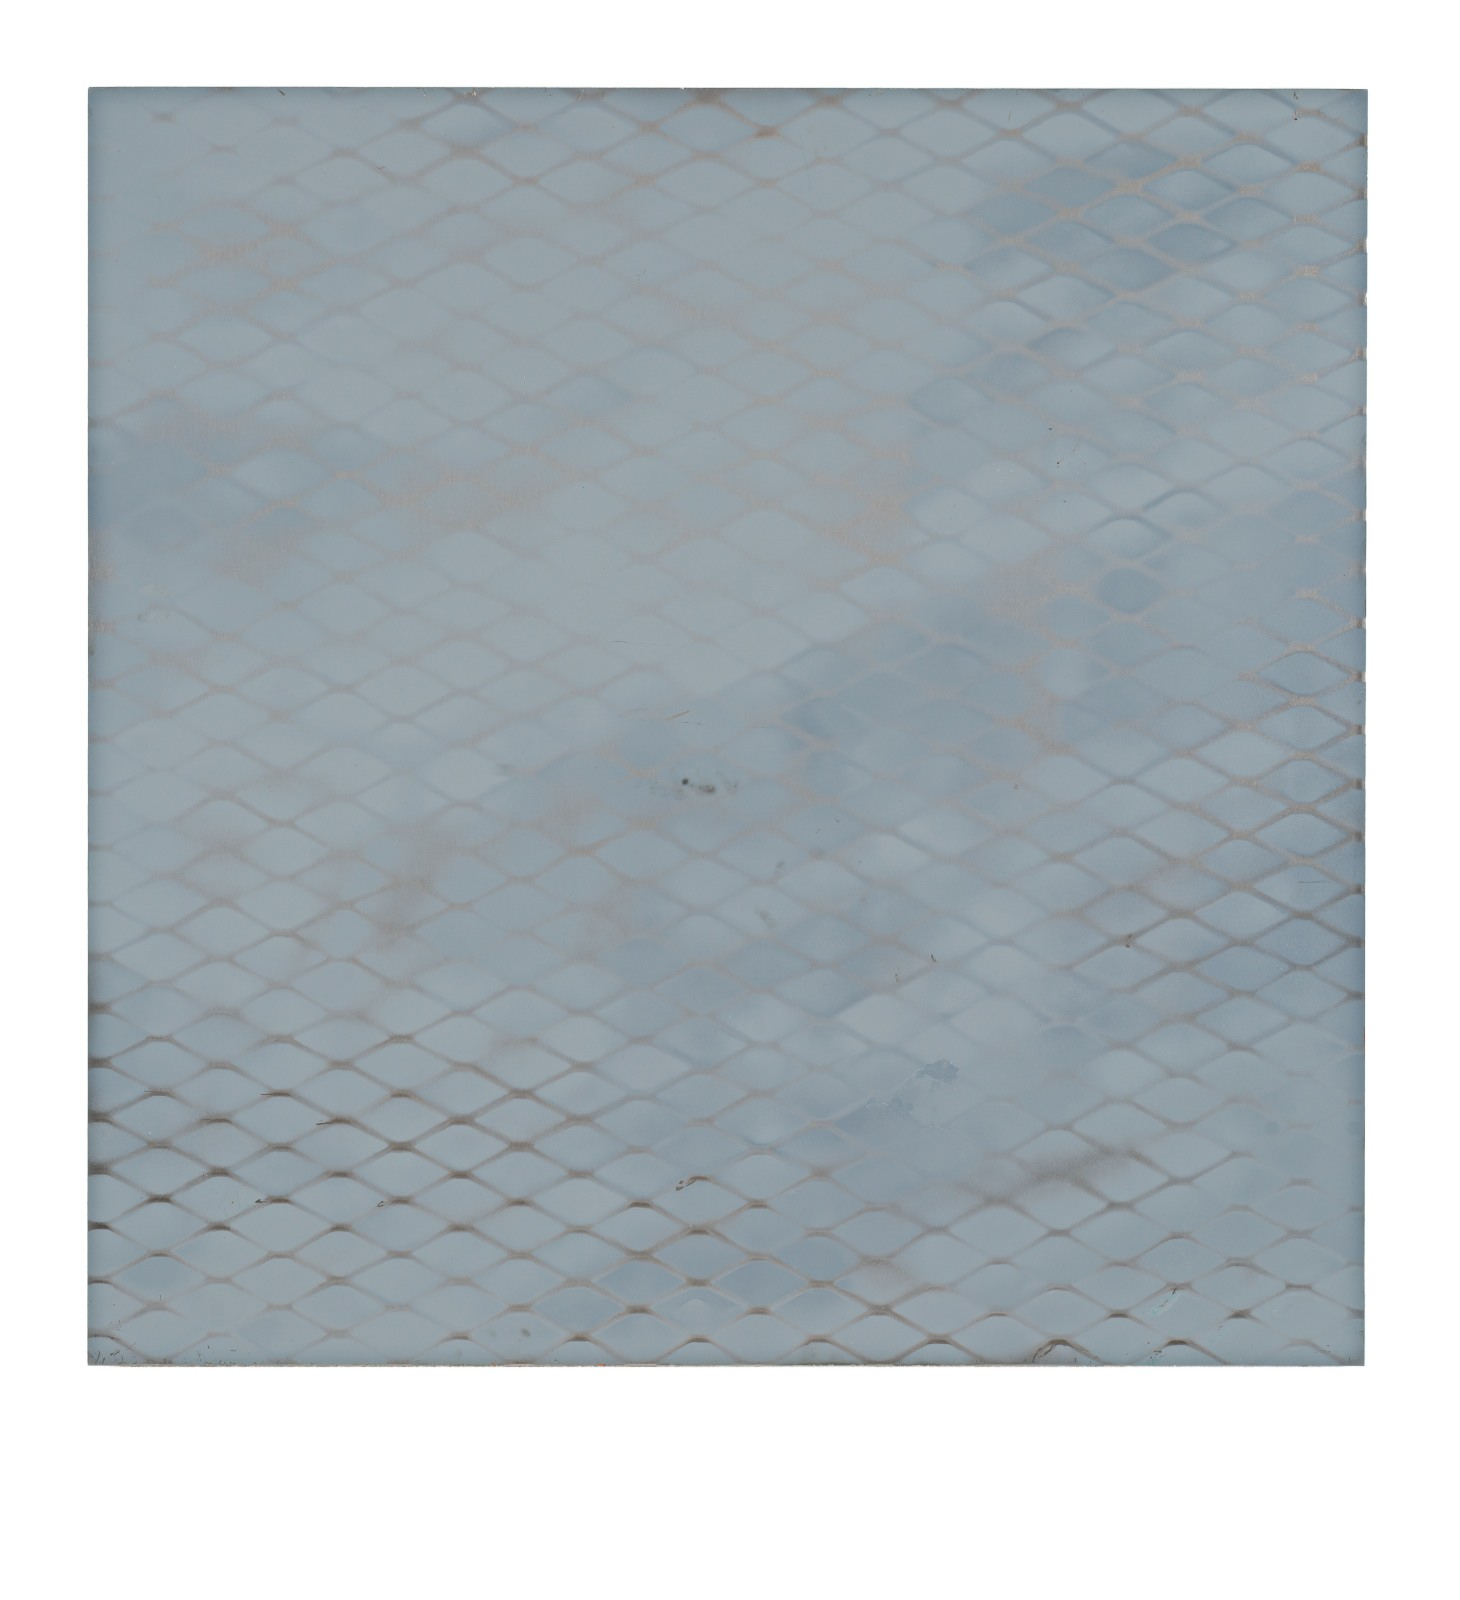 "STAIN : 40°43'14.8""N 73°56'11.0""W, 2015, spraypaint on aluminium, 81,3 x 81,3 cm"